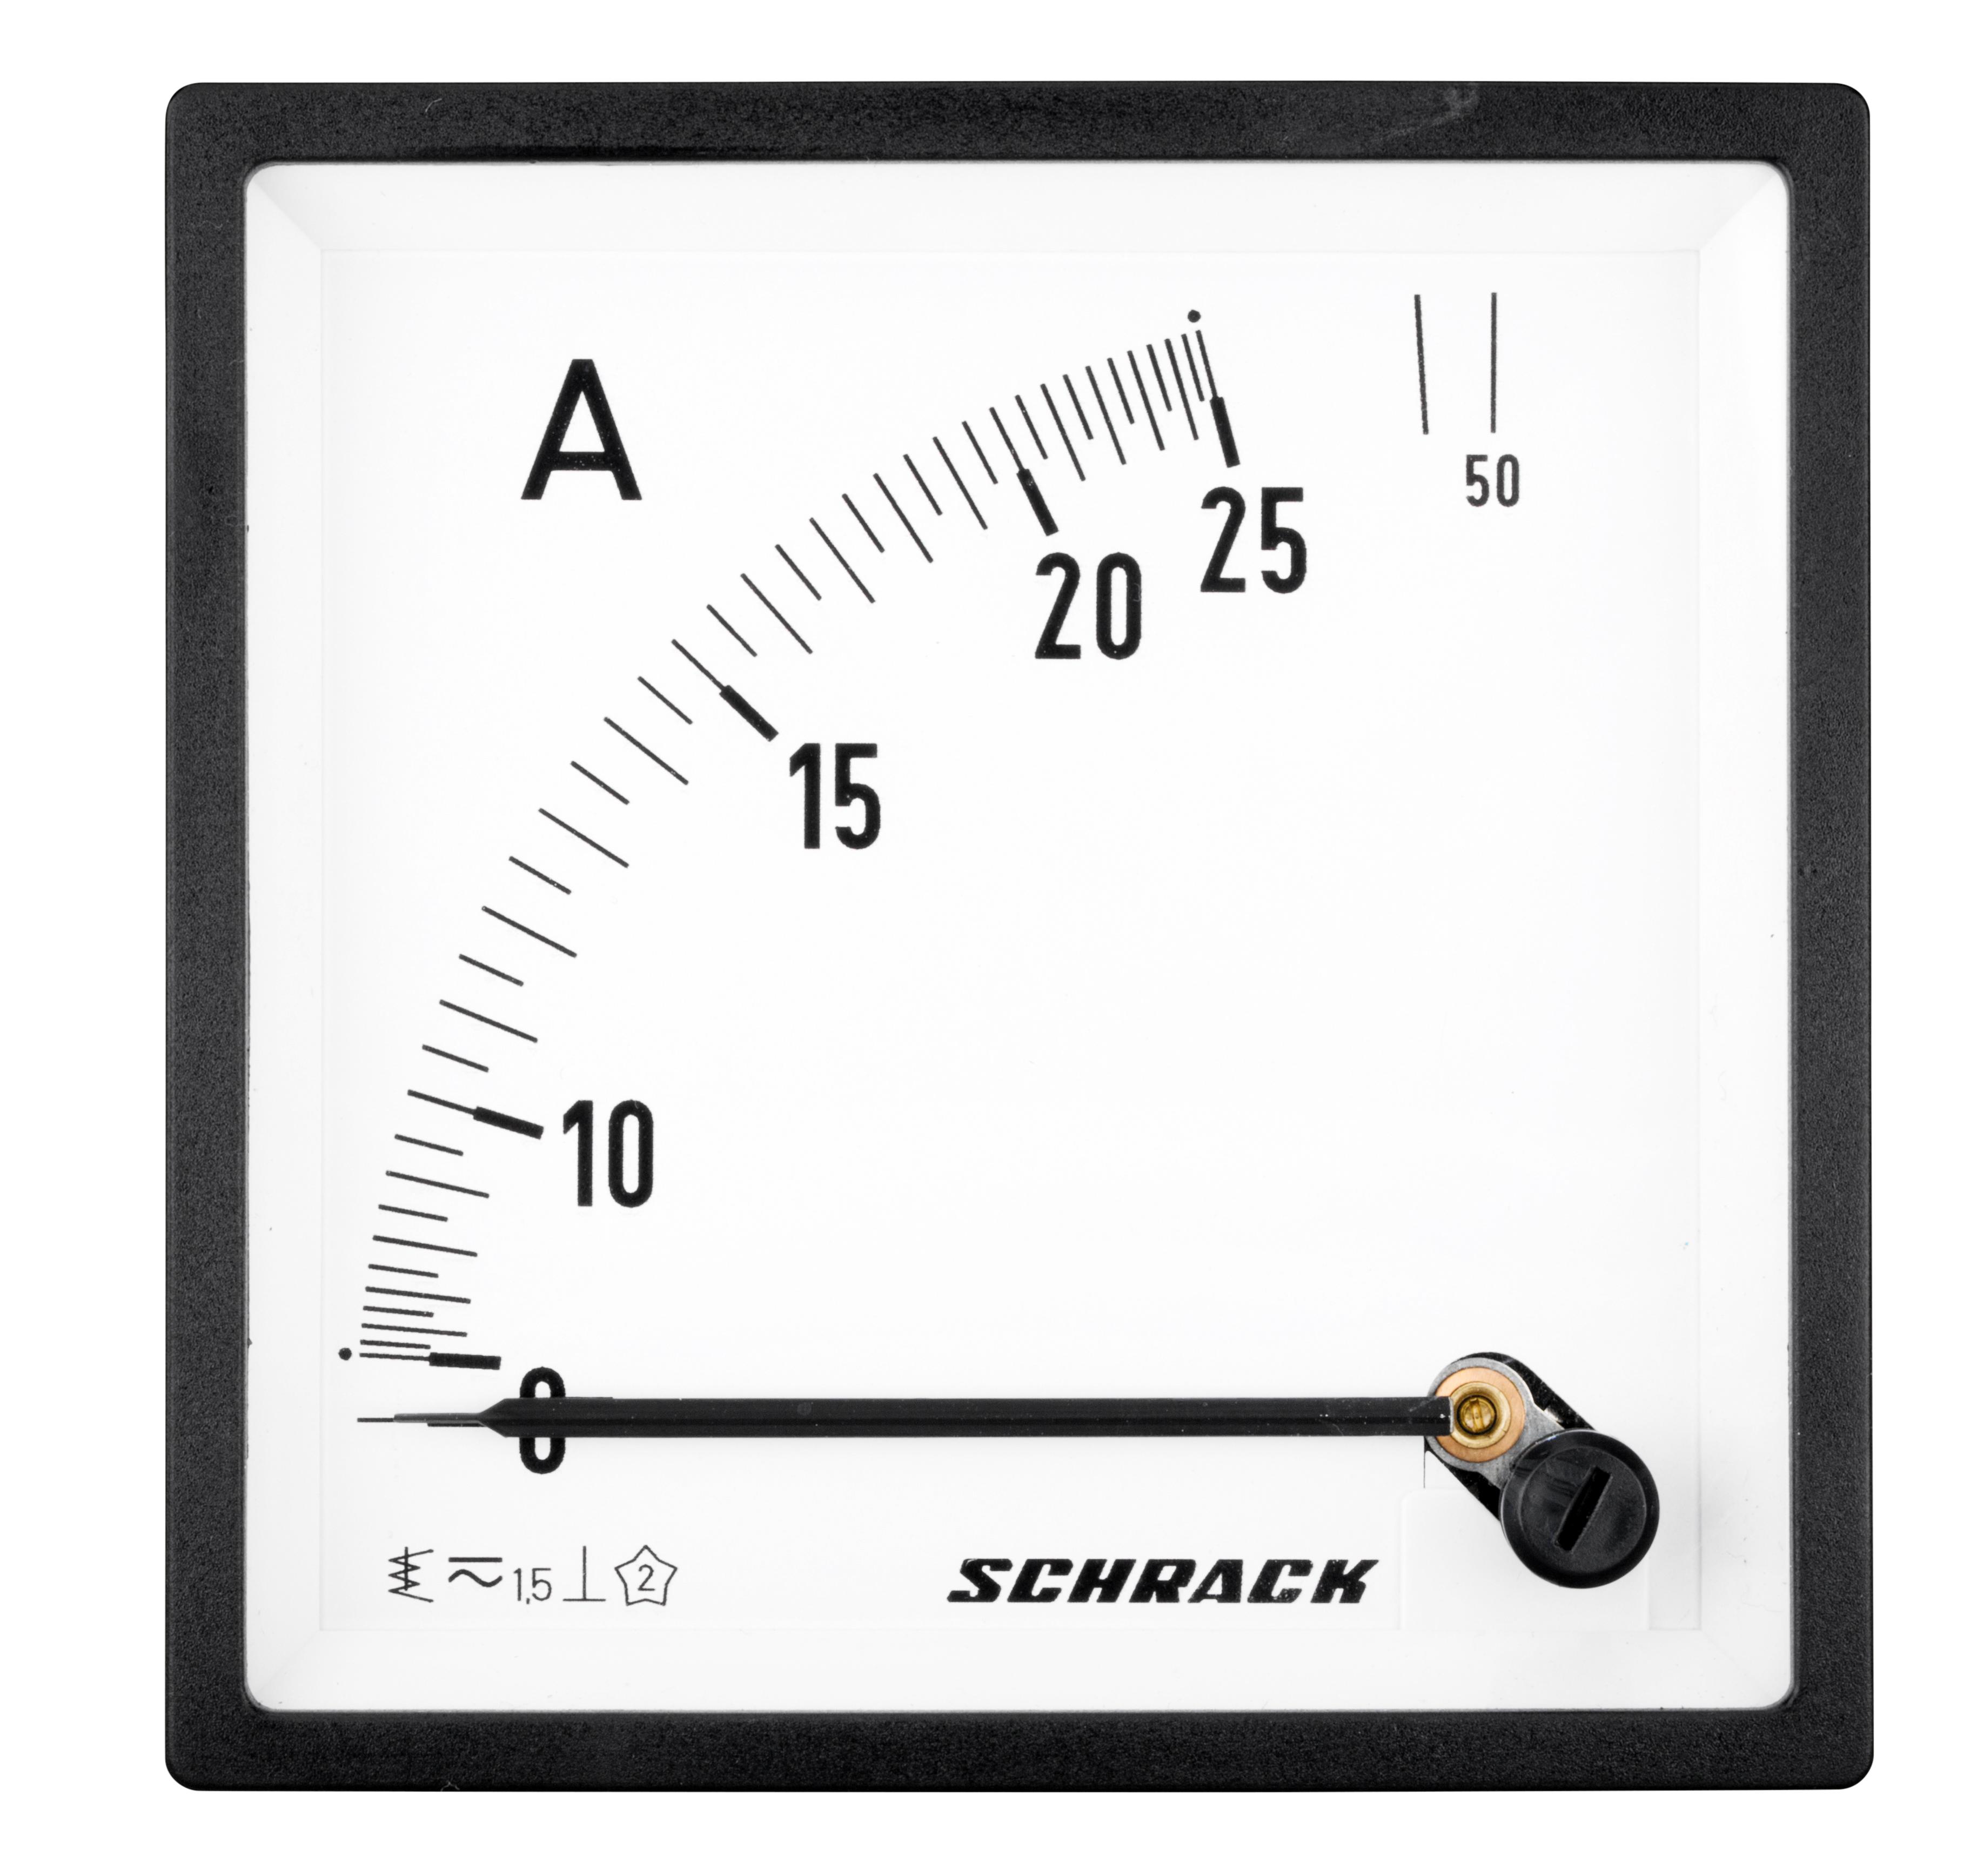 1 Stk Amperemeter, 96x96mm, 25A AC Direktmessung MGF59025-A